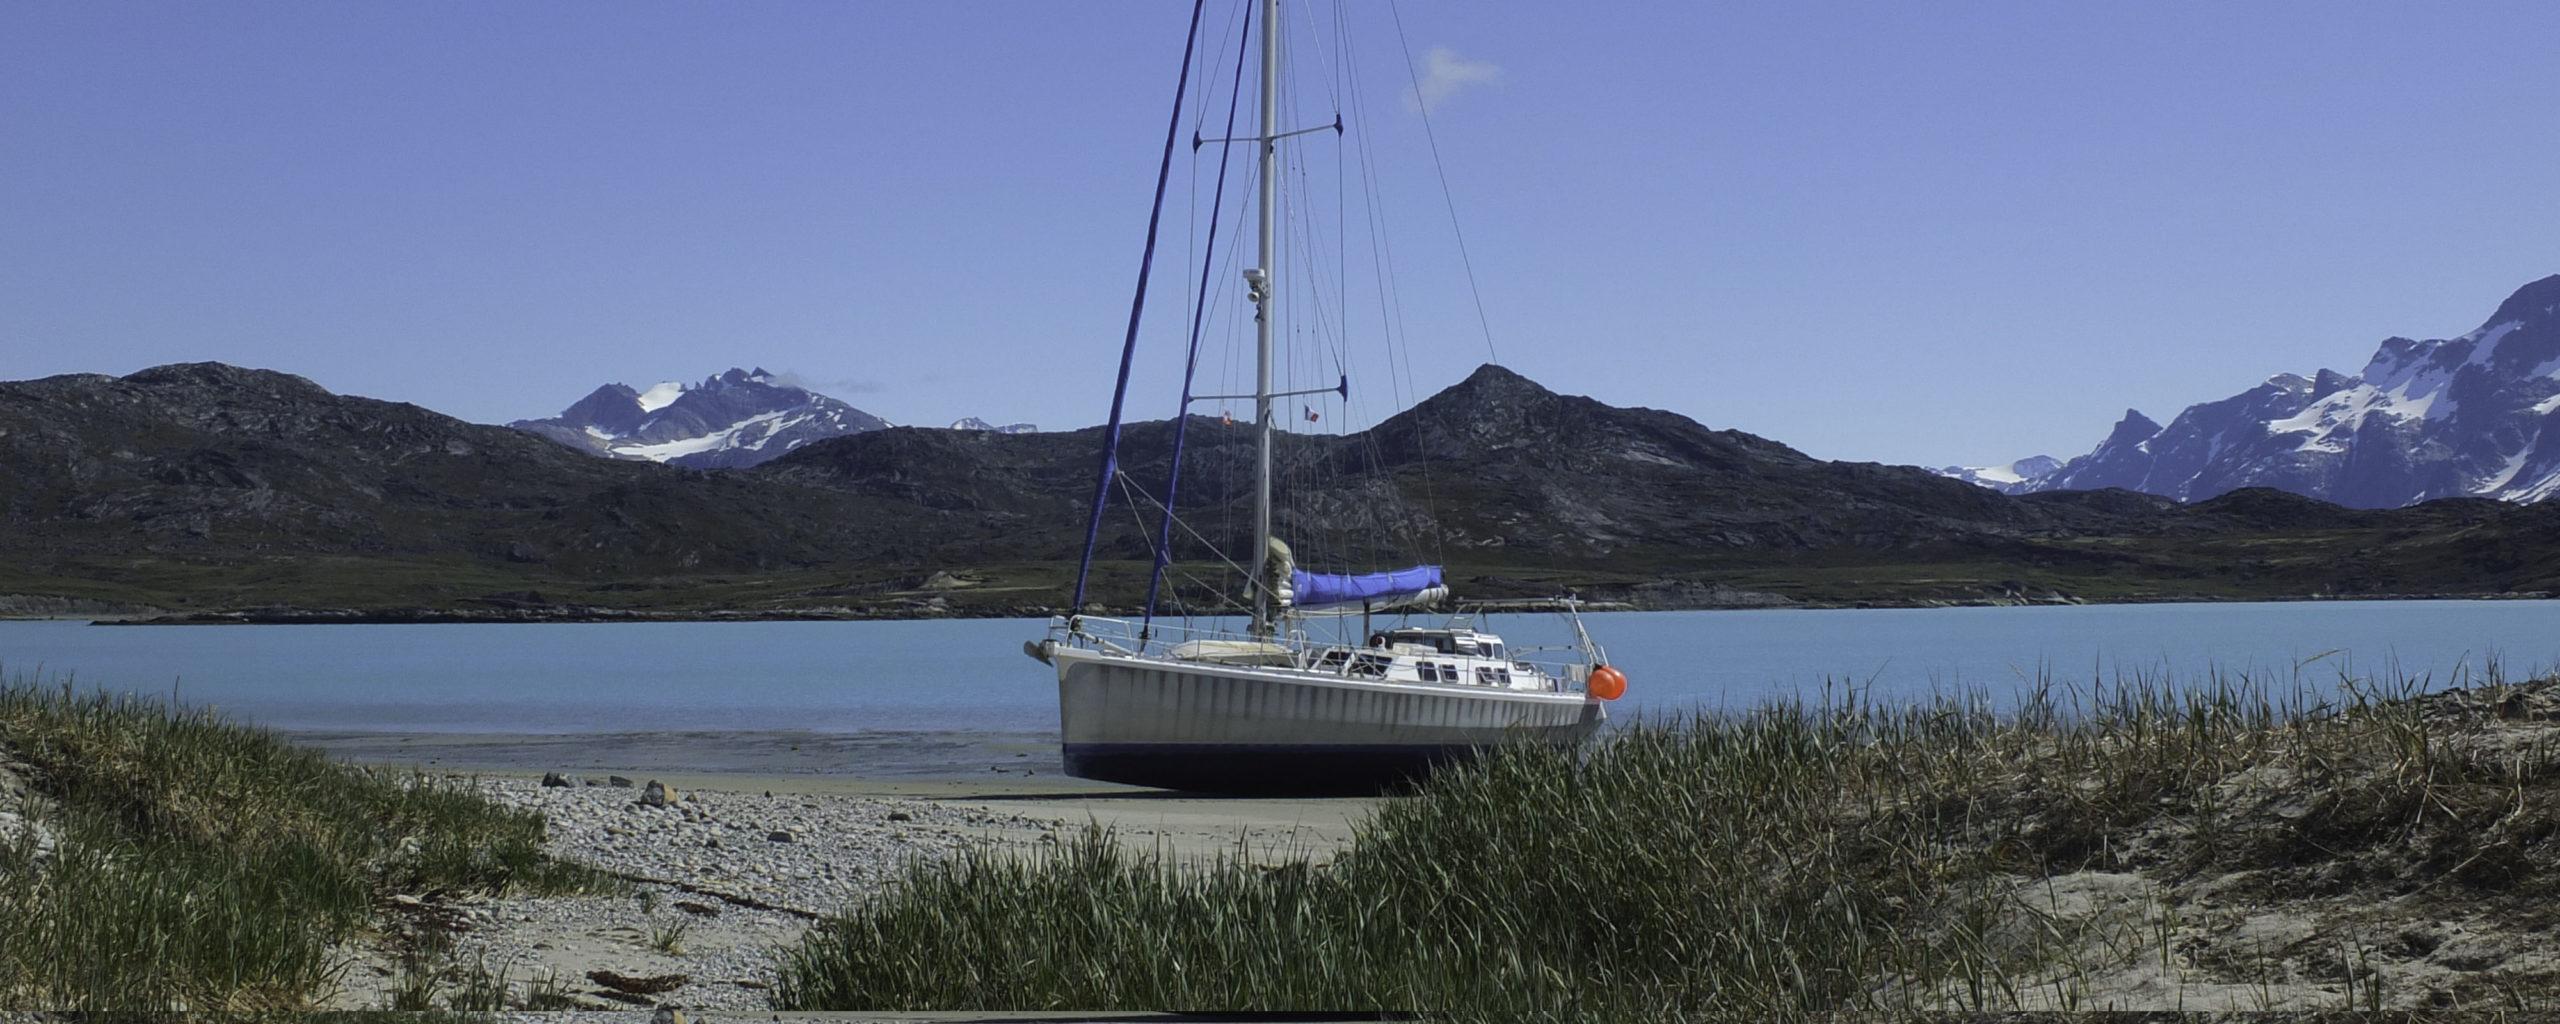 Greenland Summer 2016